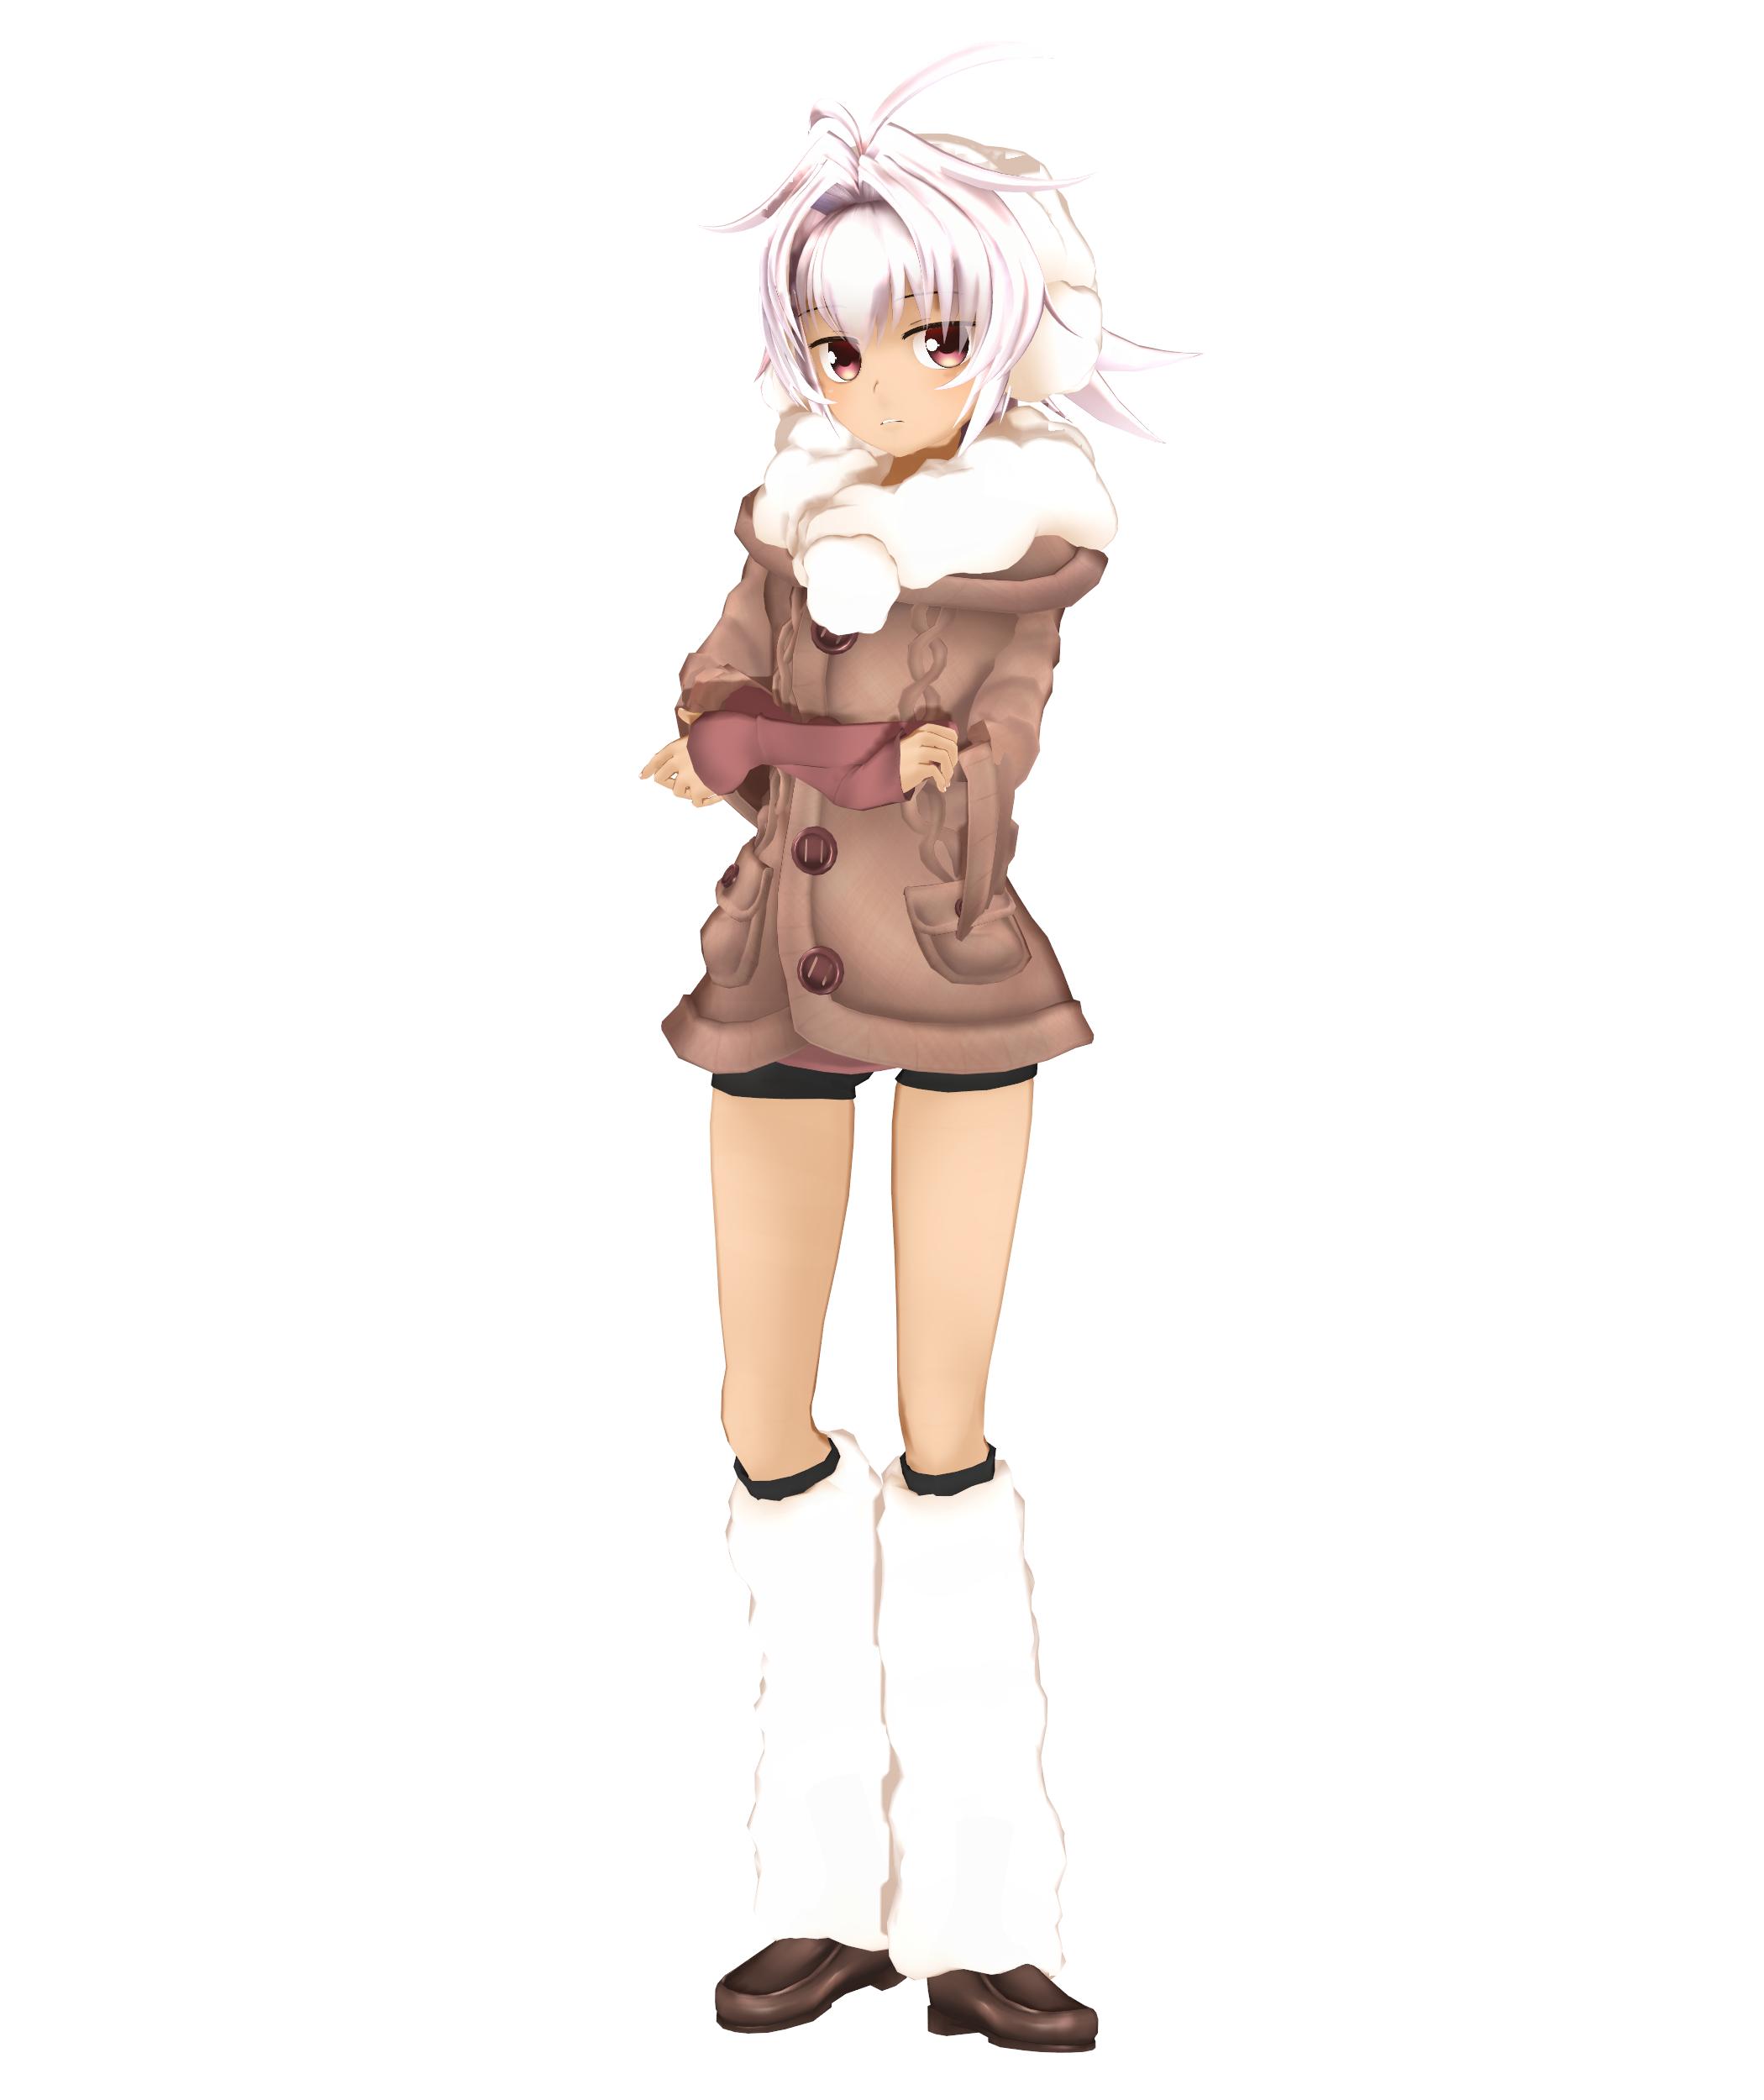 .: DL Series :. Tohka Itsuru by Duekko